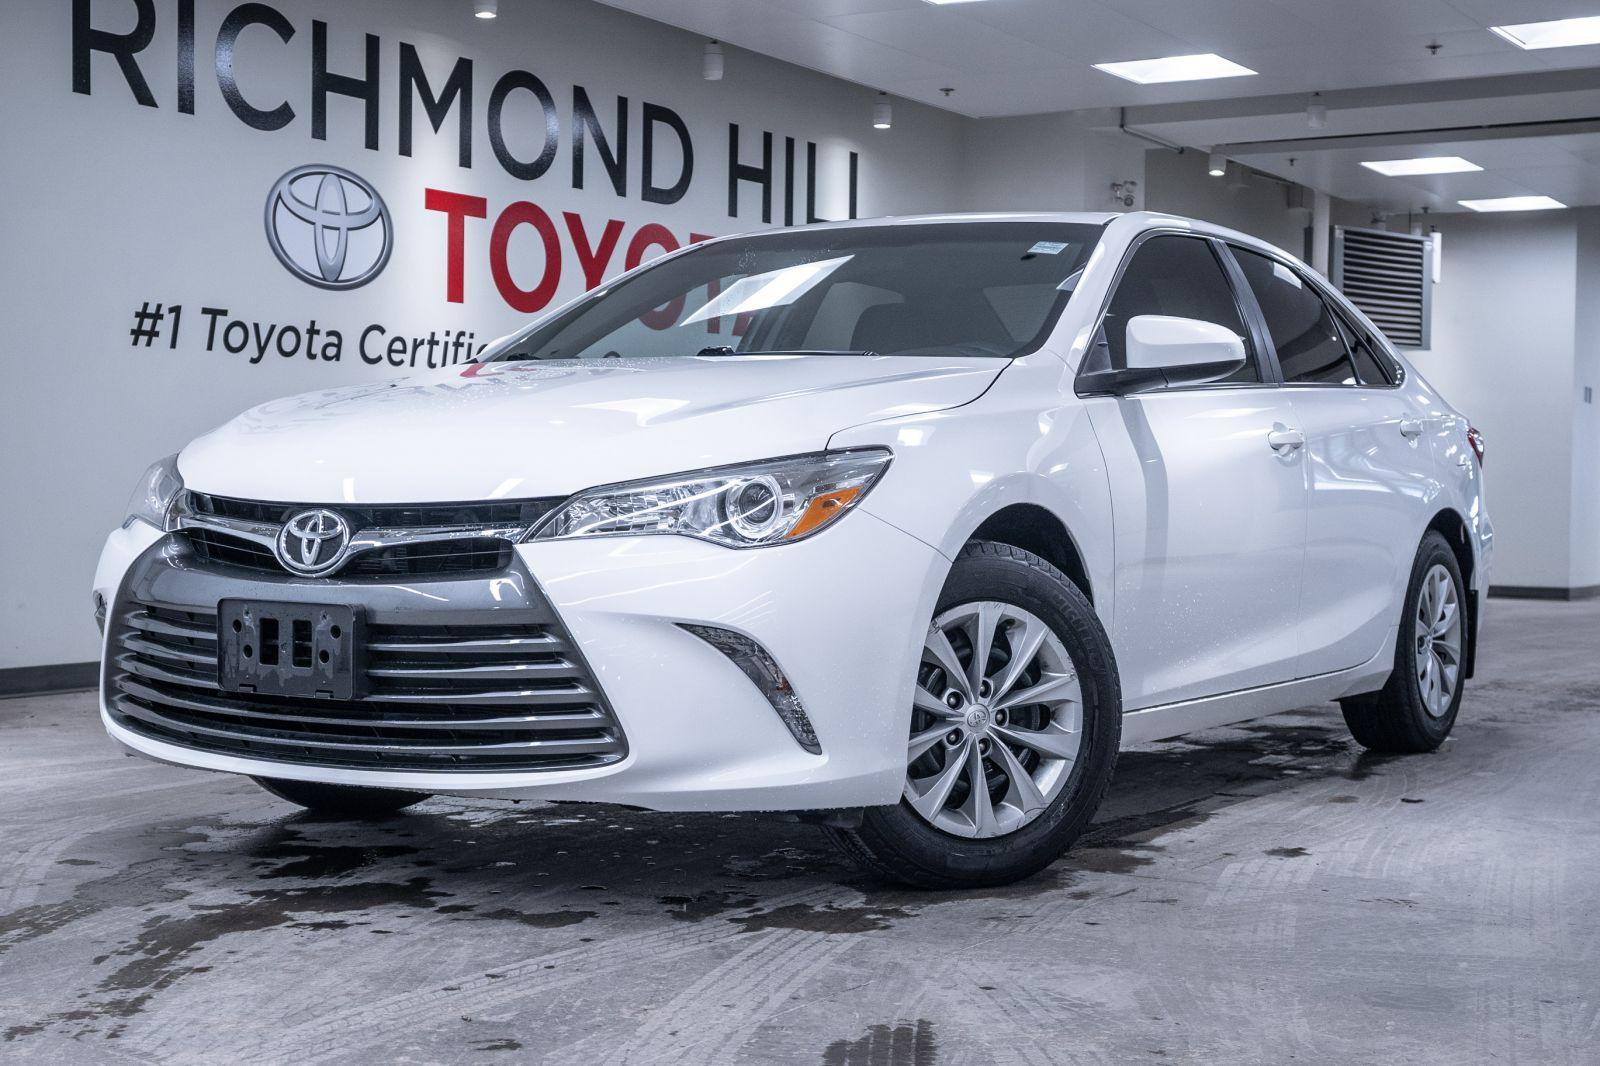 2016 Toyota Camry Image